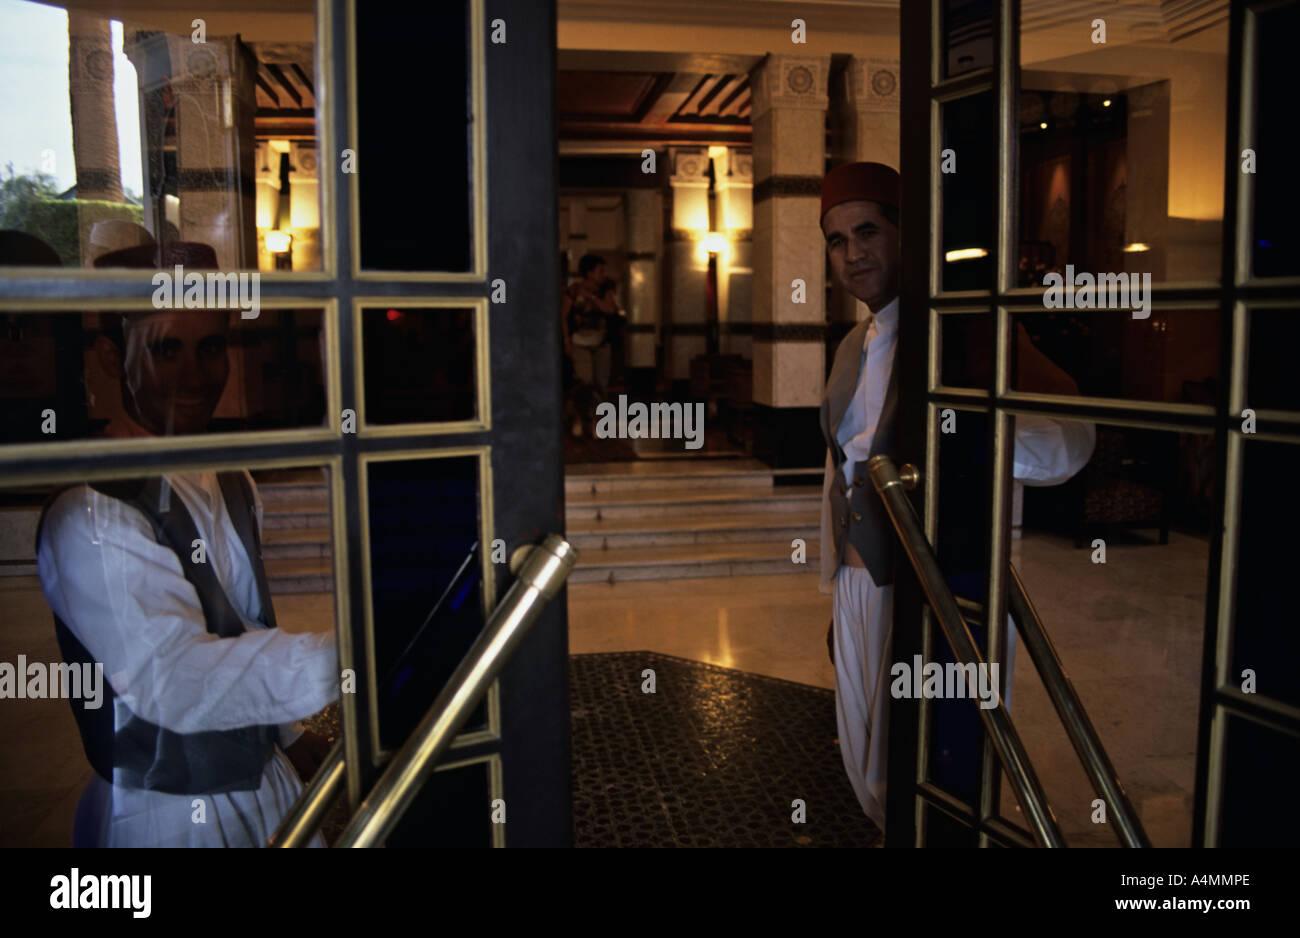 5 star hotel doorman stock photos 5 star hotel doorman stock images alamy. Black Bedroom Furniture Sets. Home Design Ideas